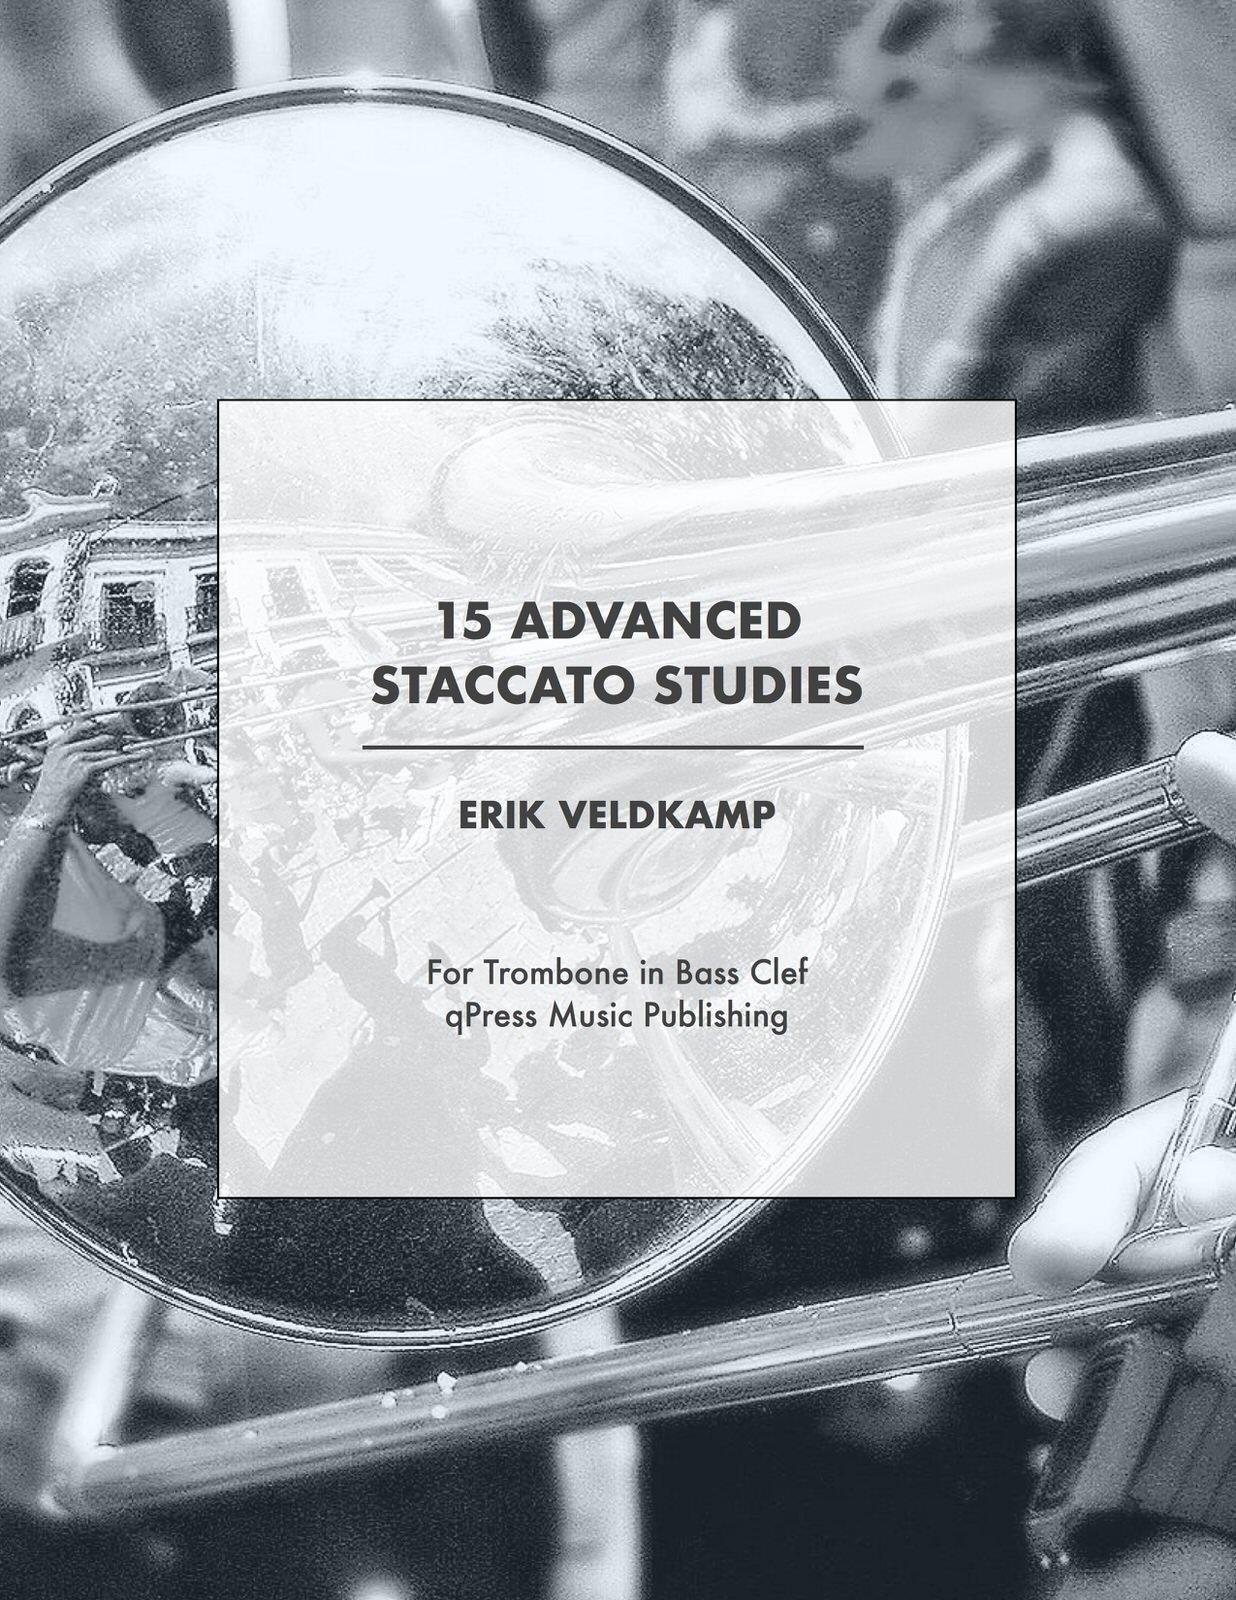 15 Advanced Staccato Studies for Trombone-p01